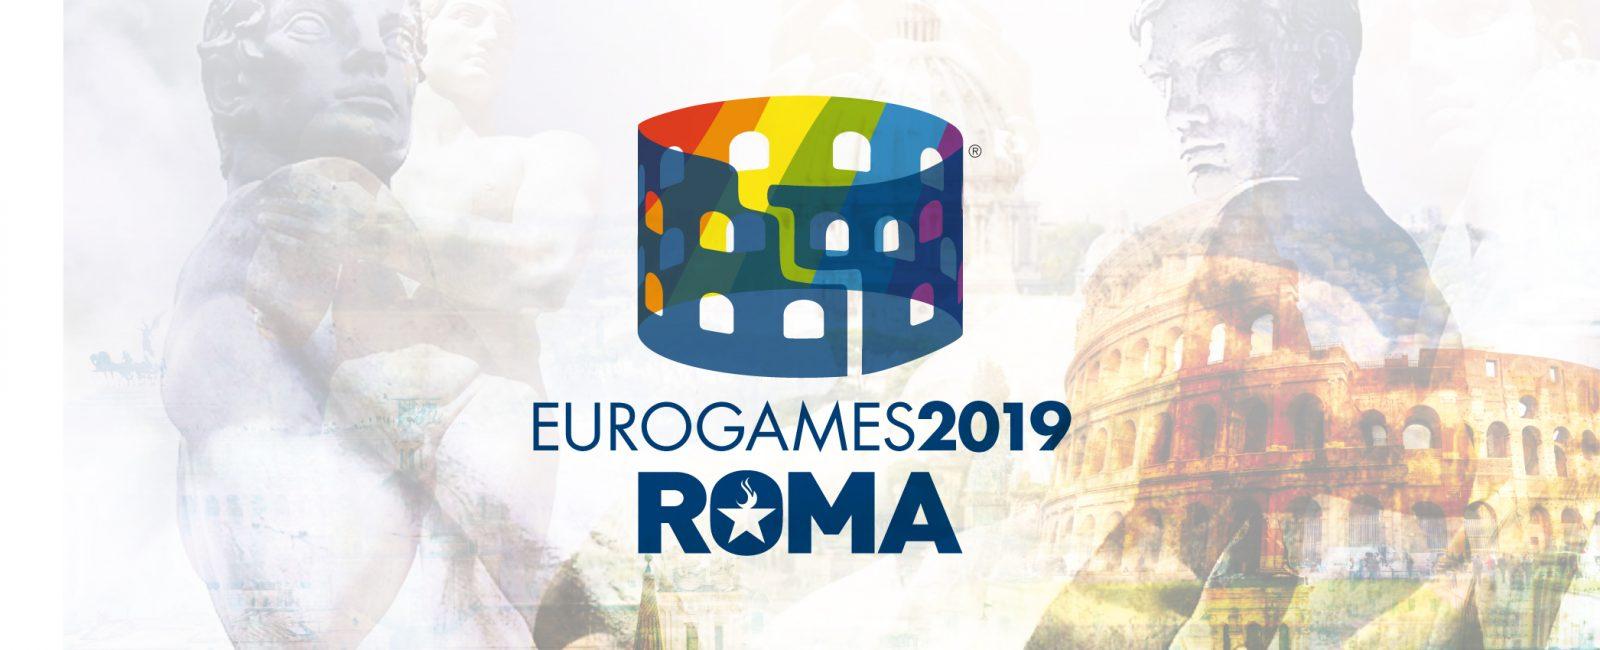 Eurogames 2019